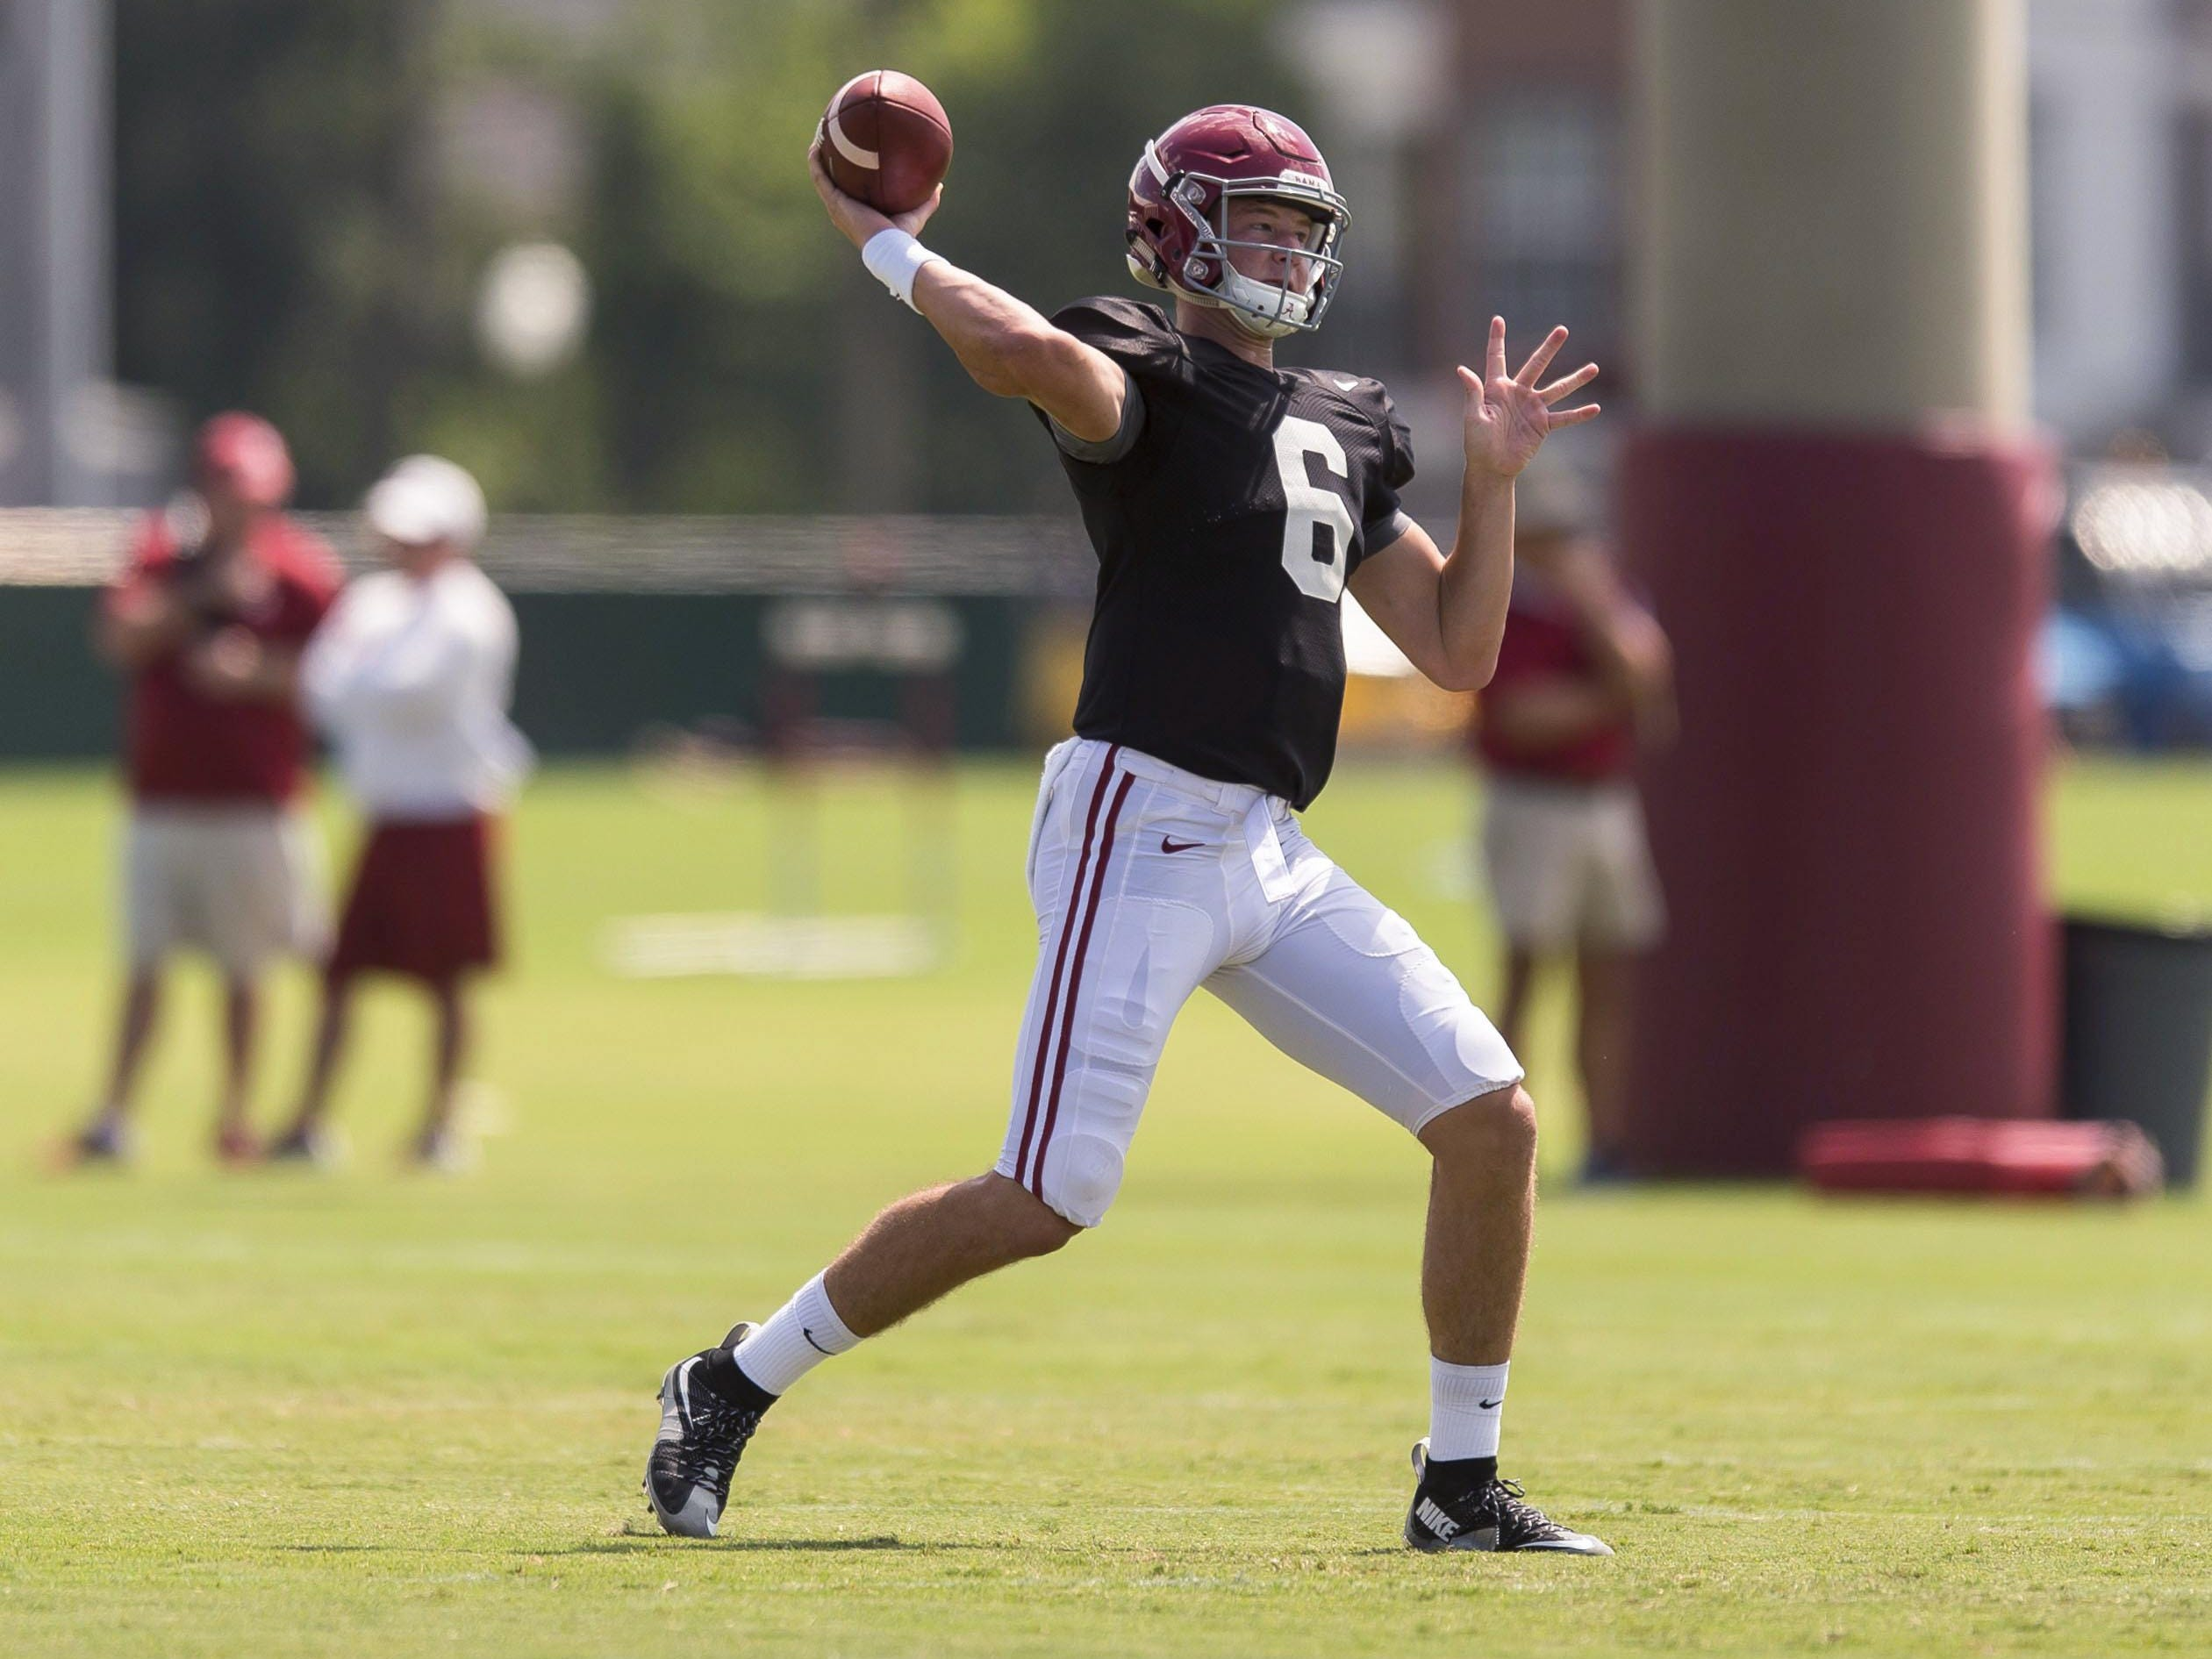 Alabama true freshman quarterback Blake Barnett has reportedly shown promise during preseason camp.